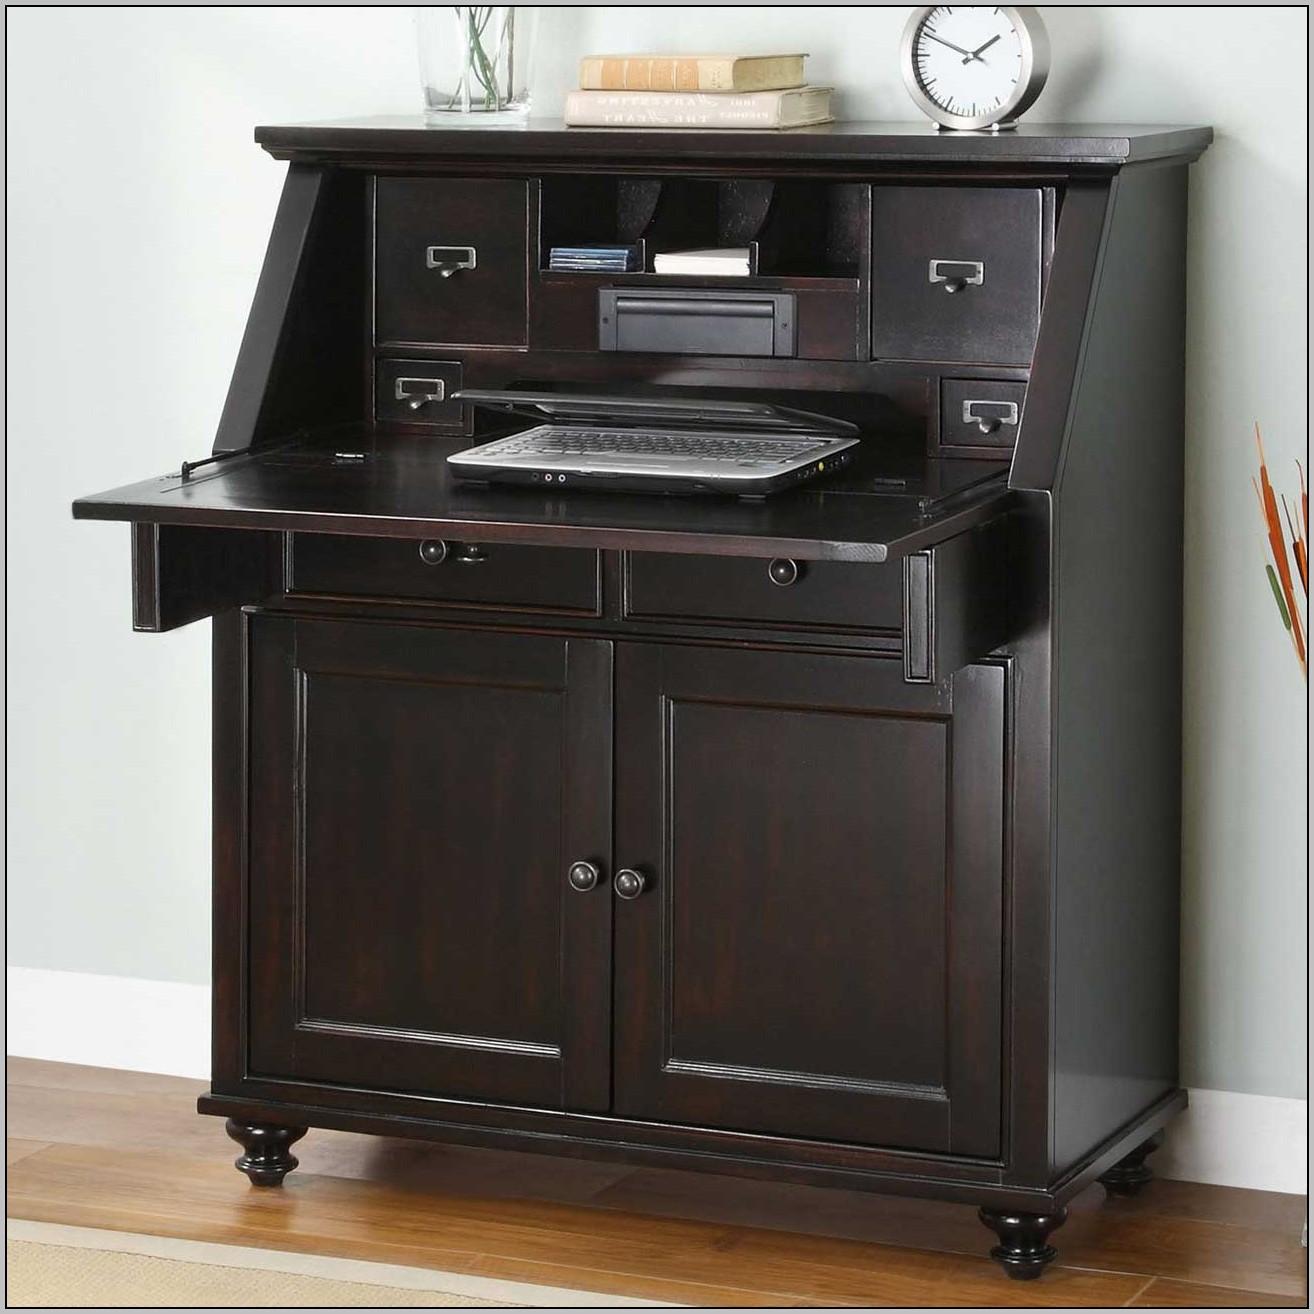 brizo kitchen faucet red appliances ikea black secretary desk download page – home design ...